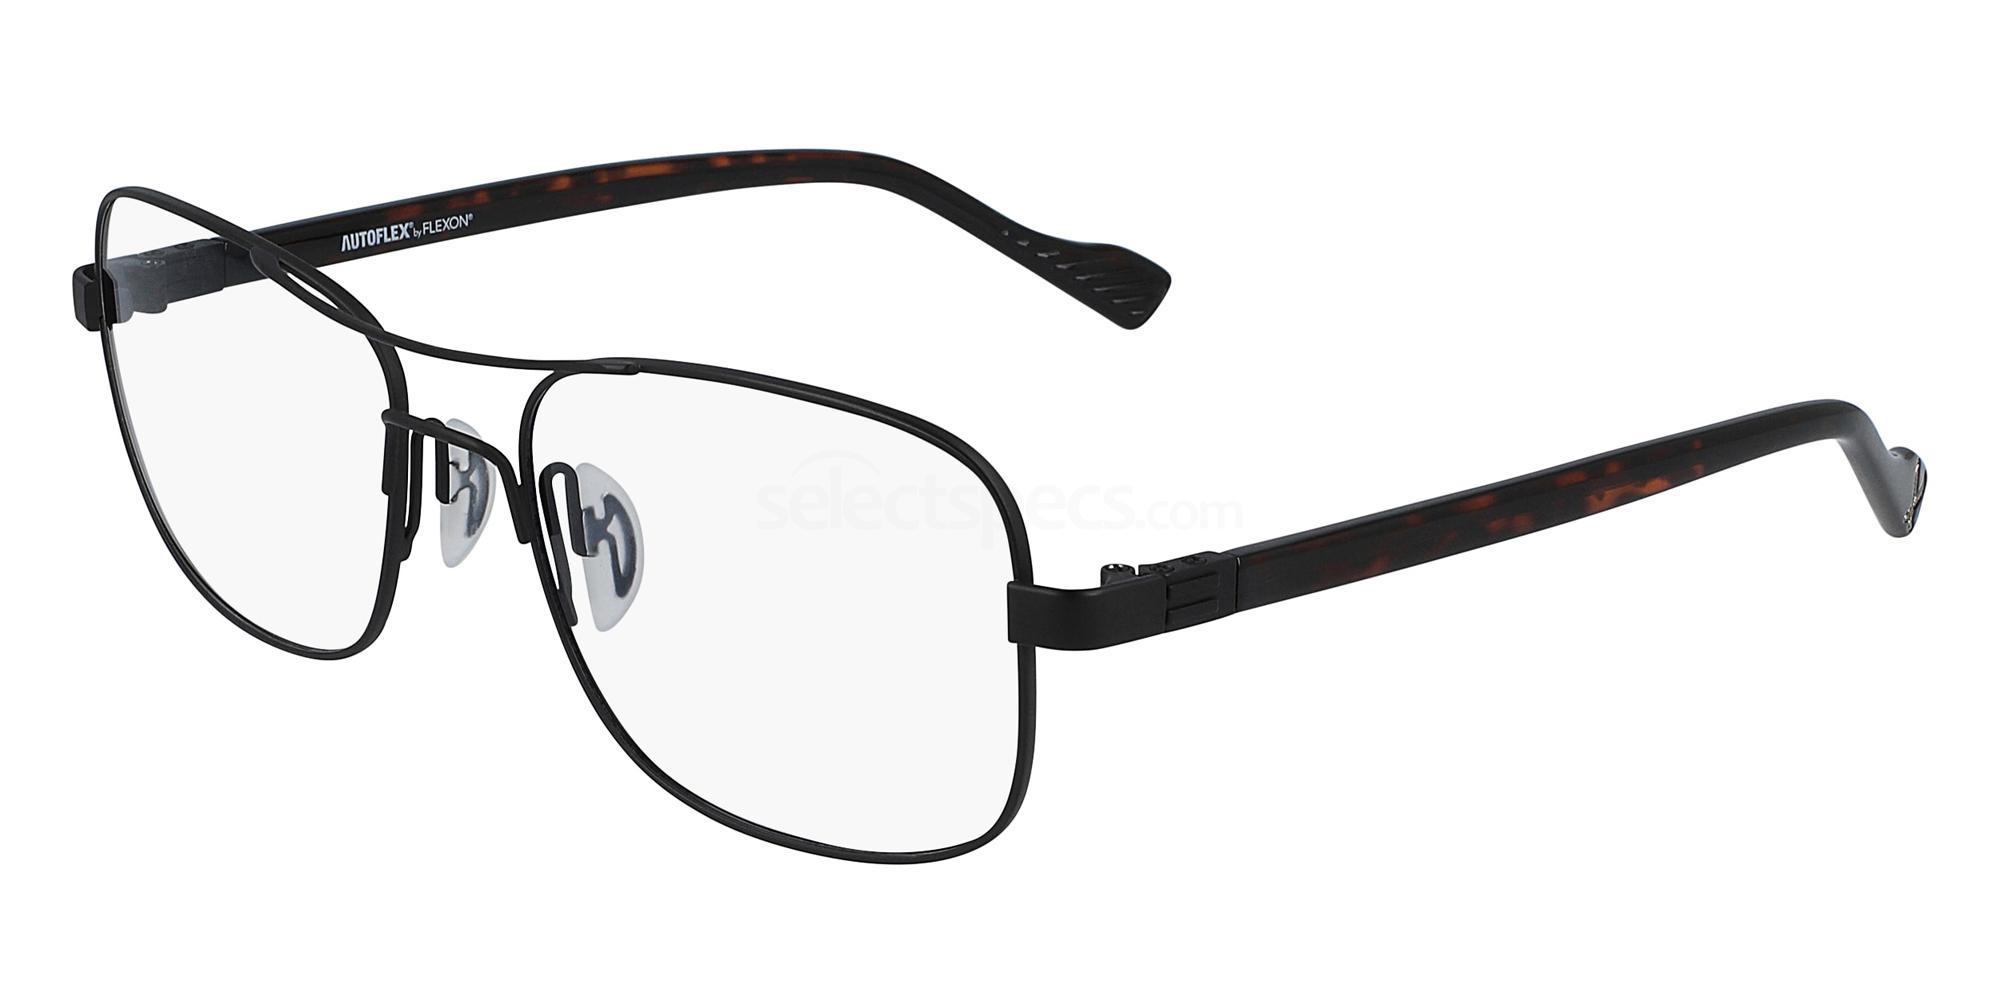 001 AUTOFLEX 115 Glasses, Flexon